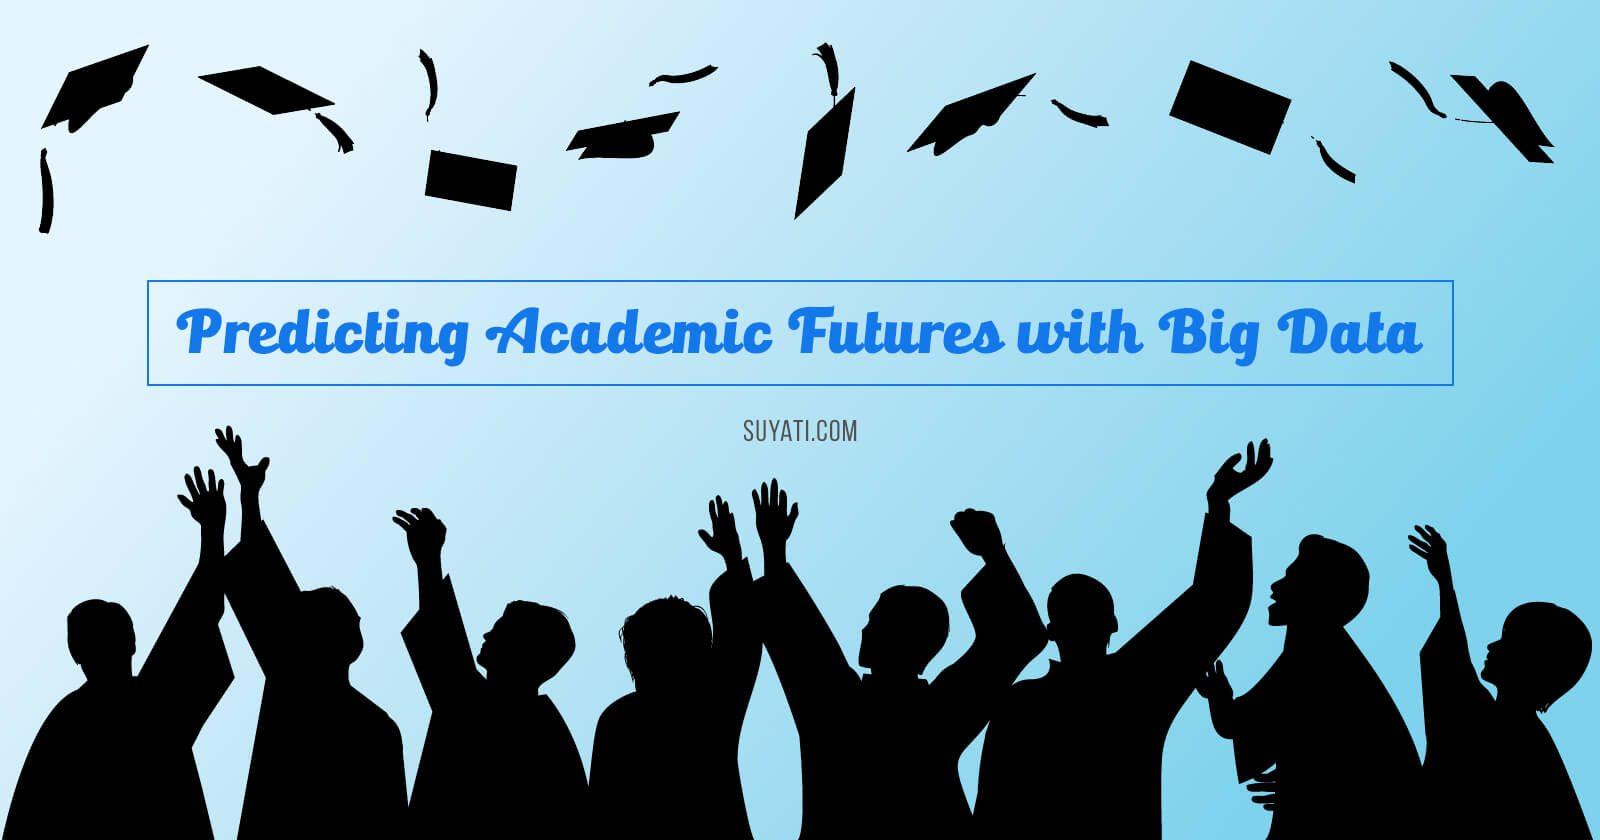 Predicting Academic Futures with Big Data